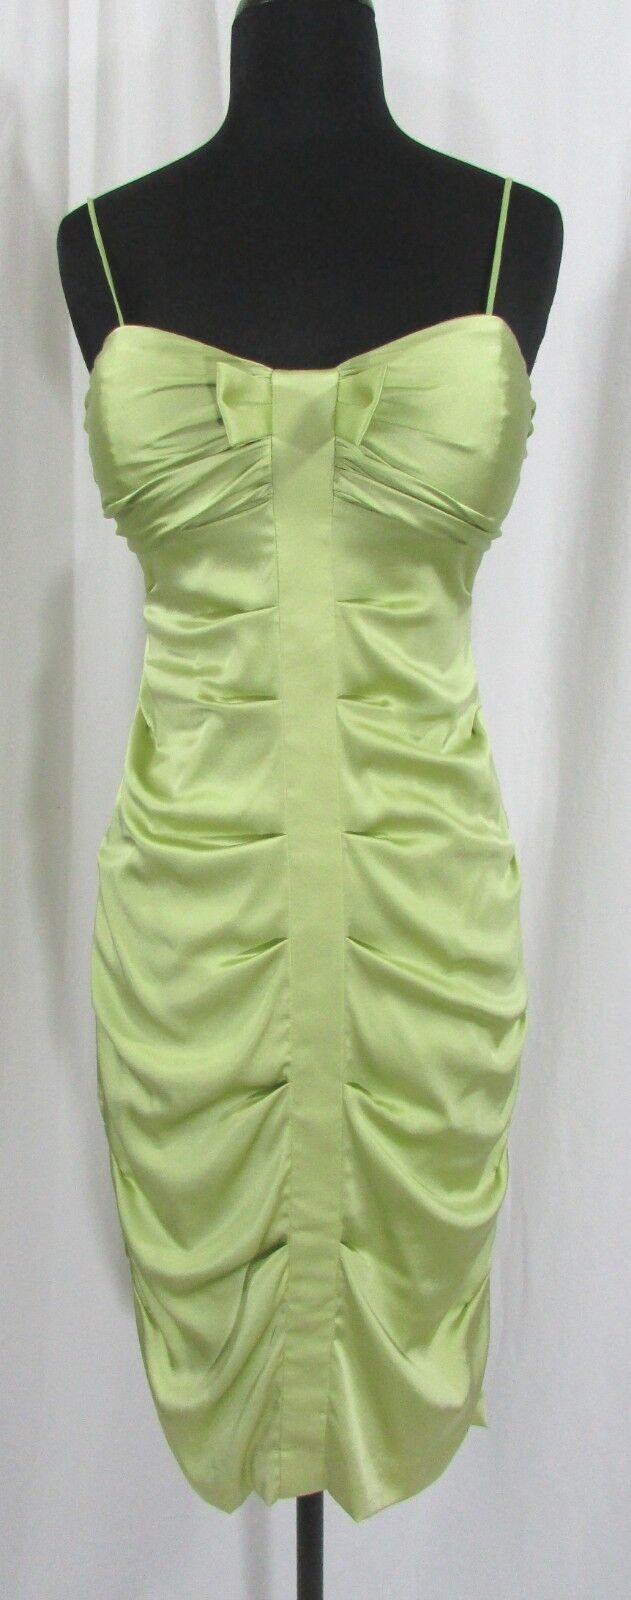 Nicole Miller Collection Dress Lime Grün Silk Blend Cocktail Short Dress Größe 2